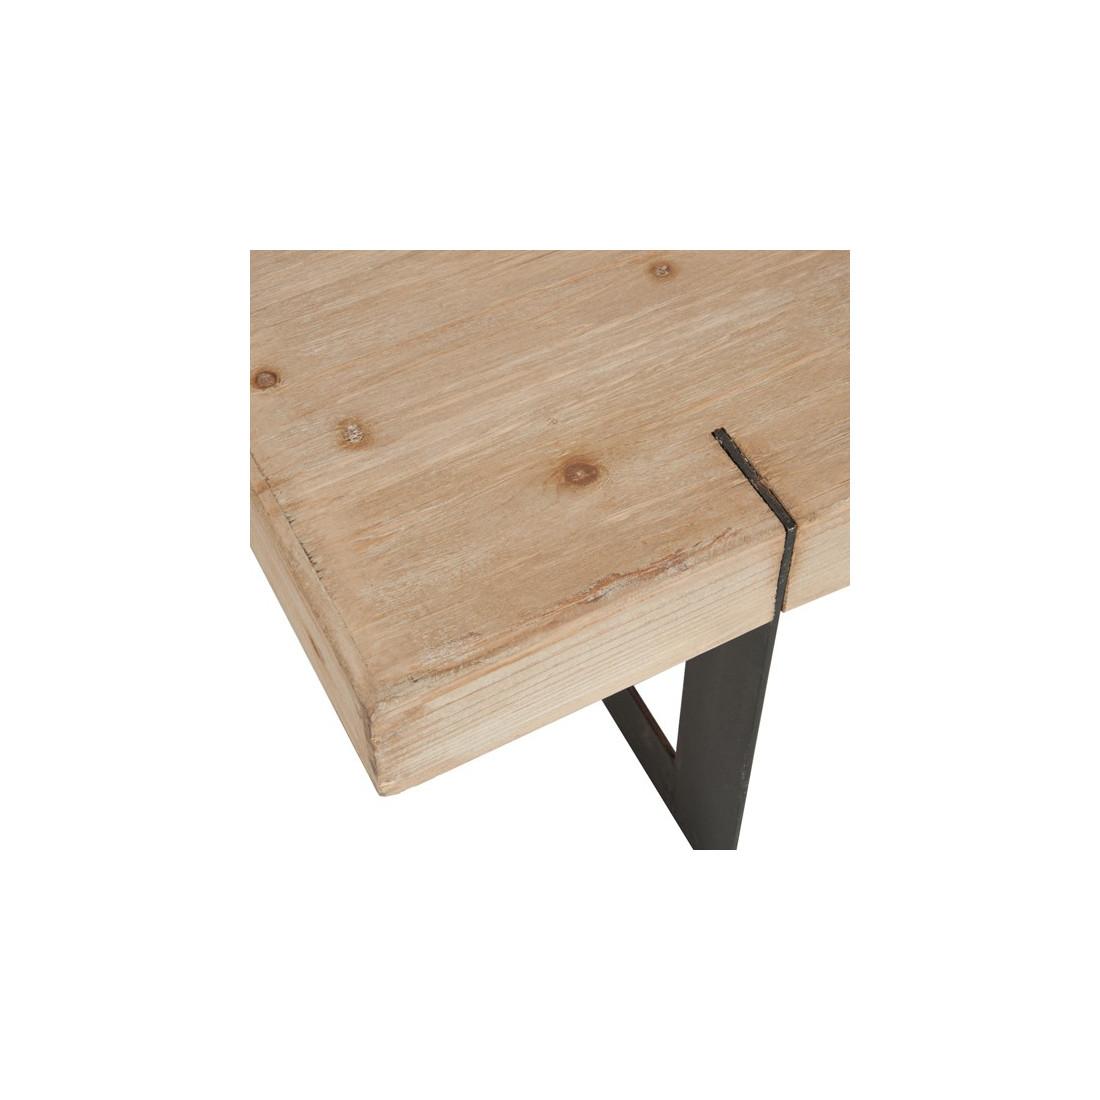 table basse bois grande taille id e inspirante pour la conception de la maison. Black Bedroom Furniture Sets. Home Design Ideas